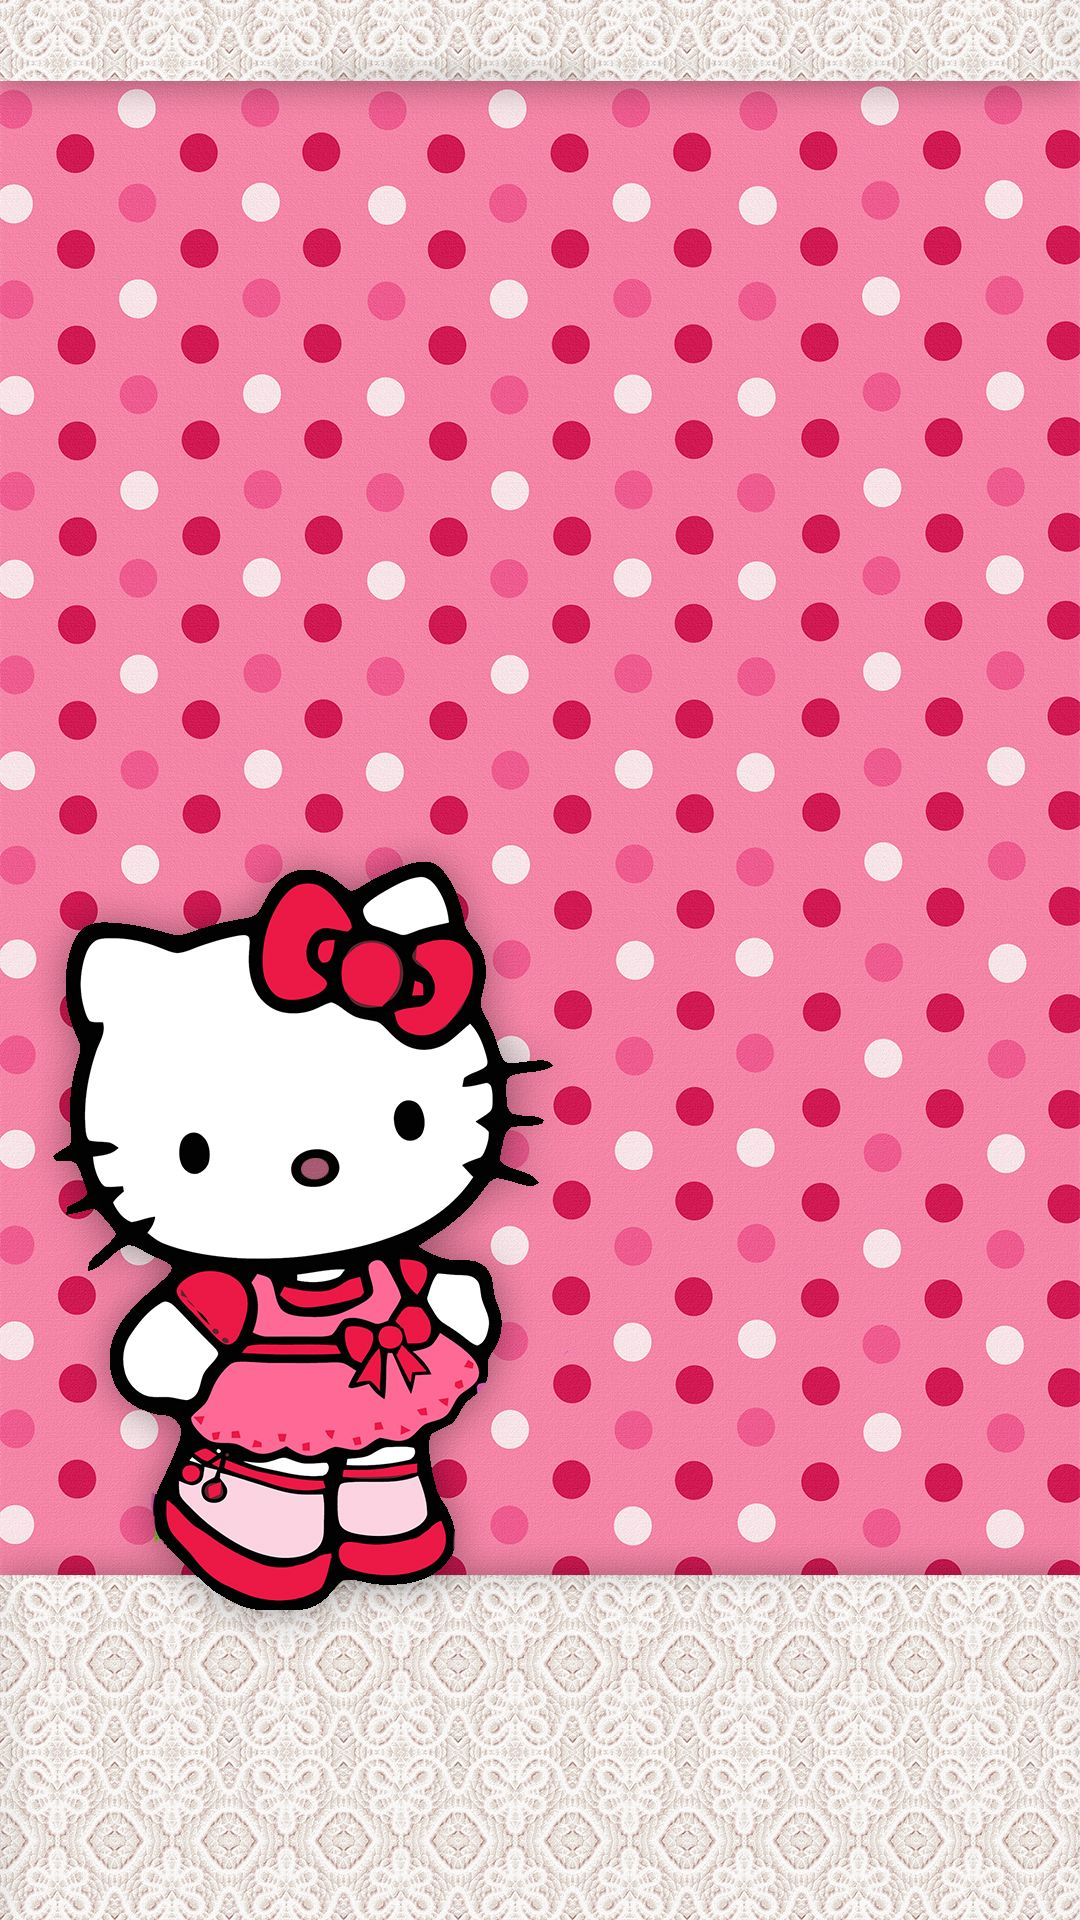 HK.jpg 1,080×1,920 pixels HELLO KITTY Pinterest